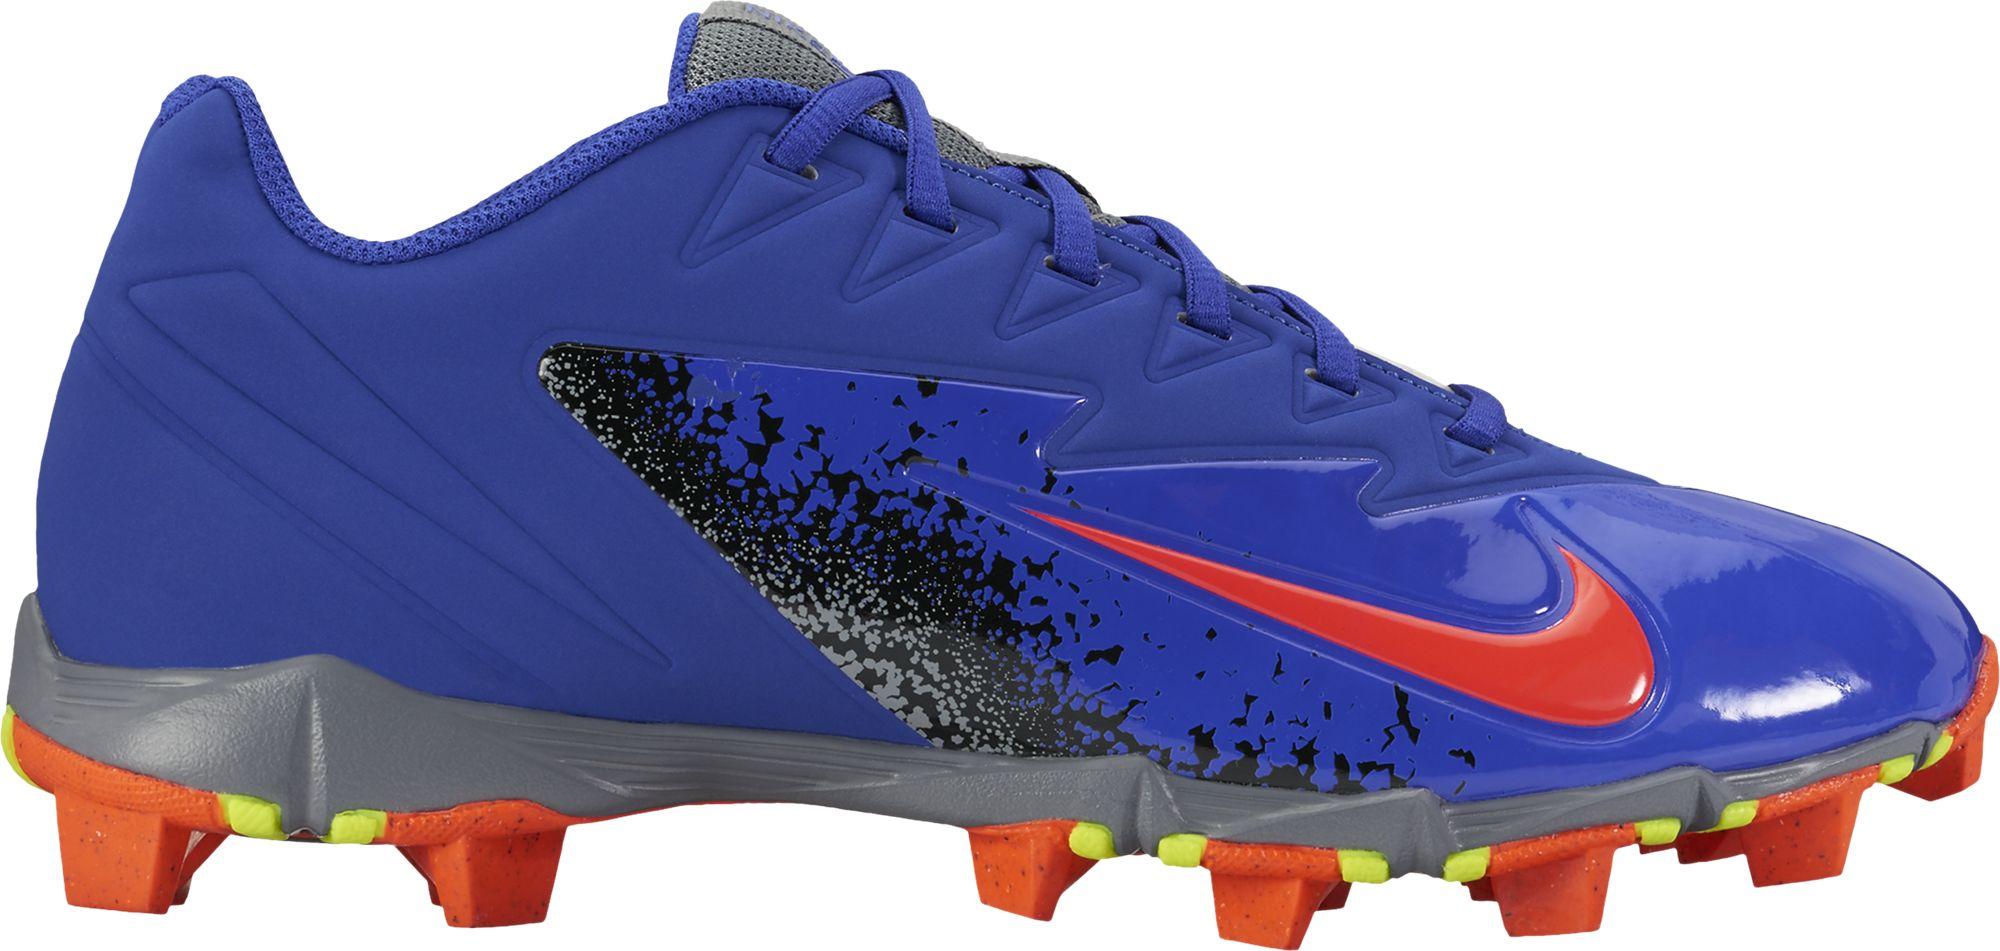 Men s Nike Vapor Ultrafly Keystone Baseball Cleat - Sieverts Sporting Goods a06c2bd2f